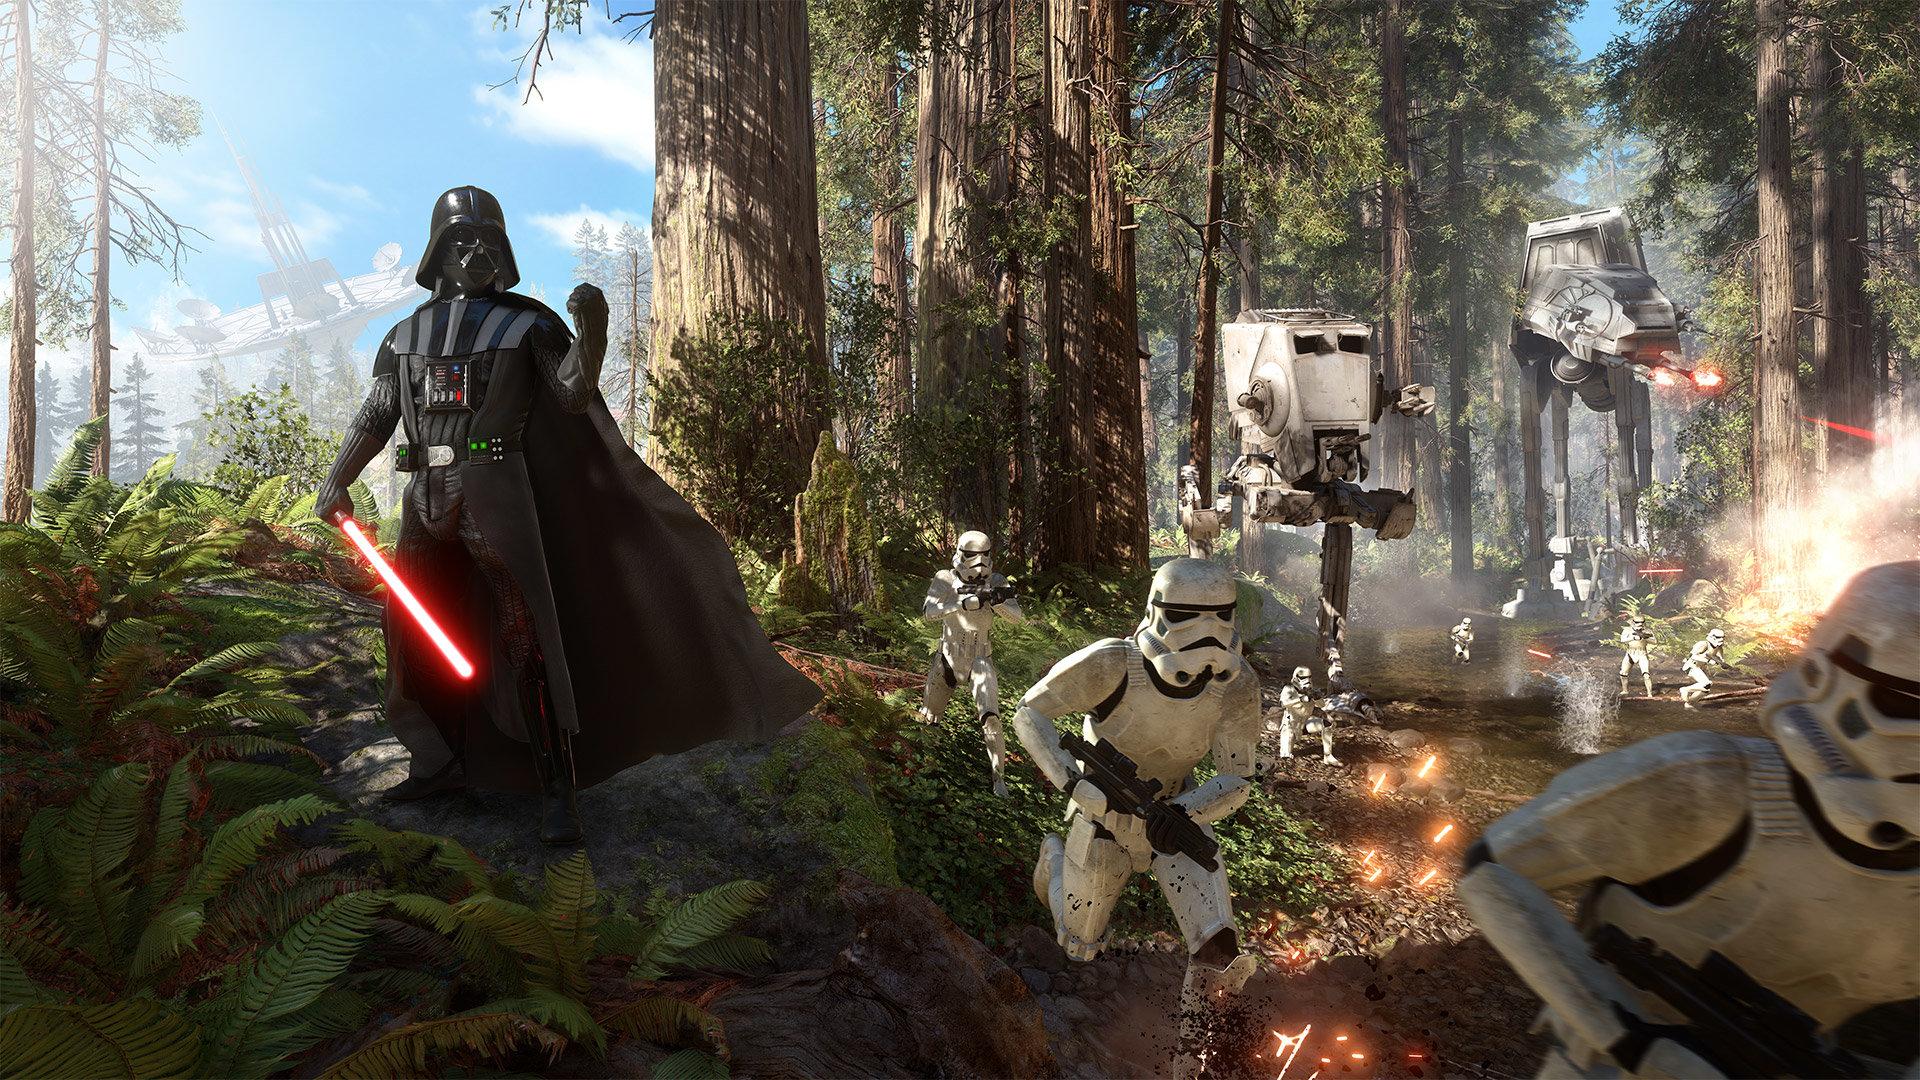 Download Hd 1080p Star Wars Battlefront Desktop Wallpaper Id 162434 For Free